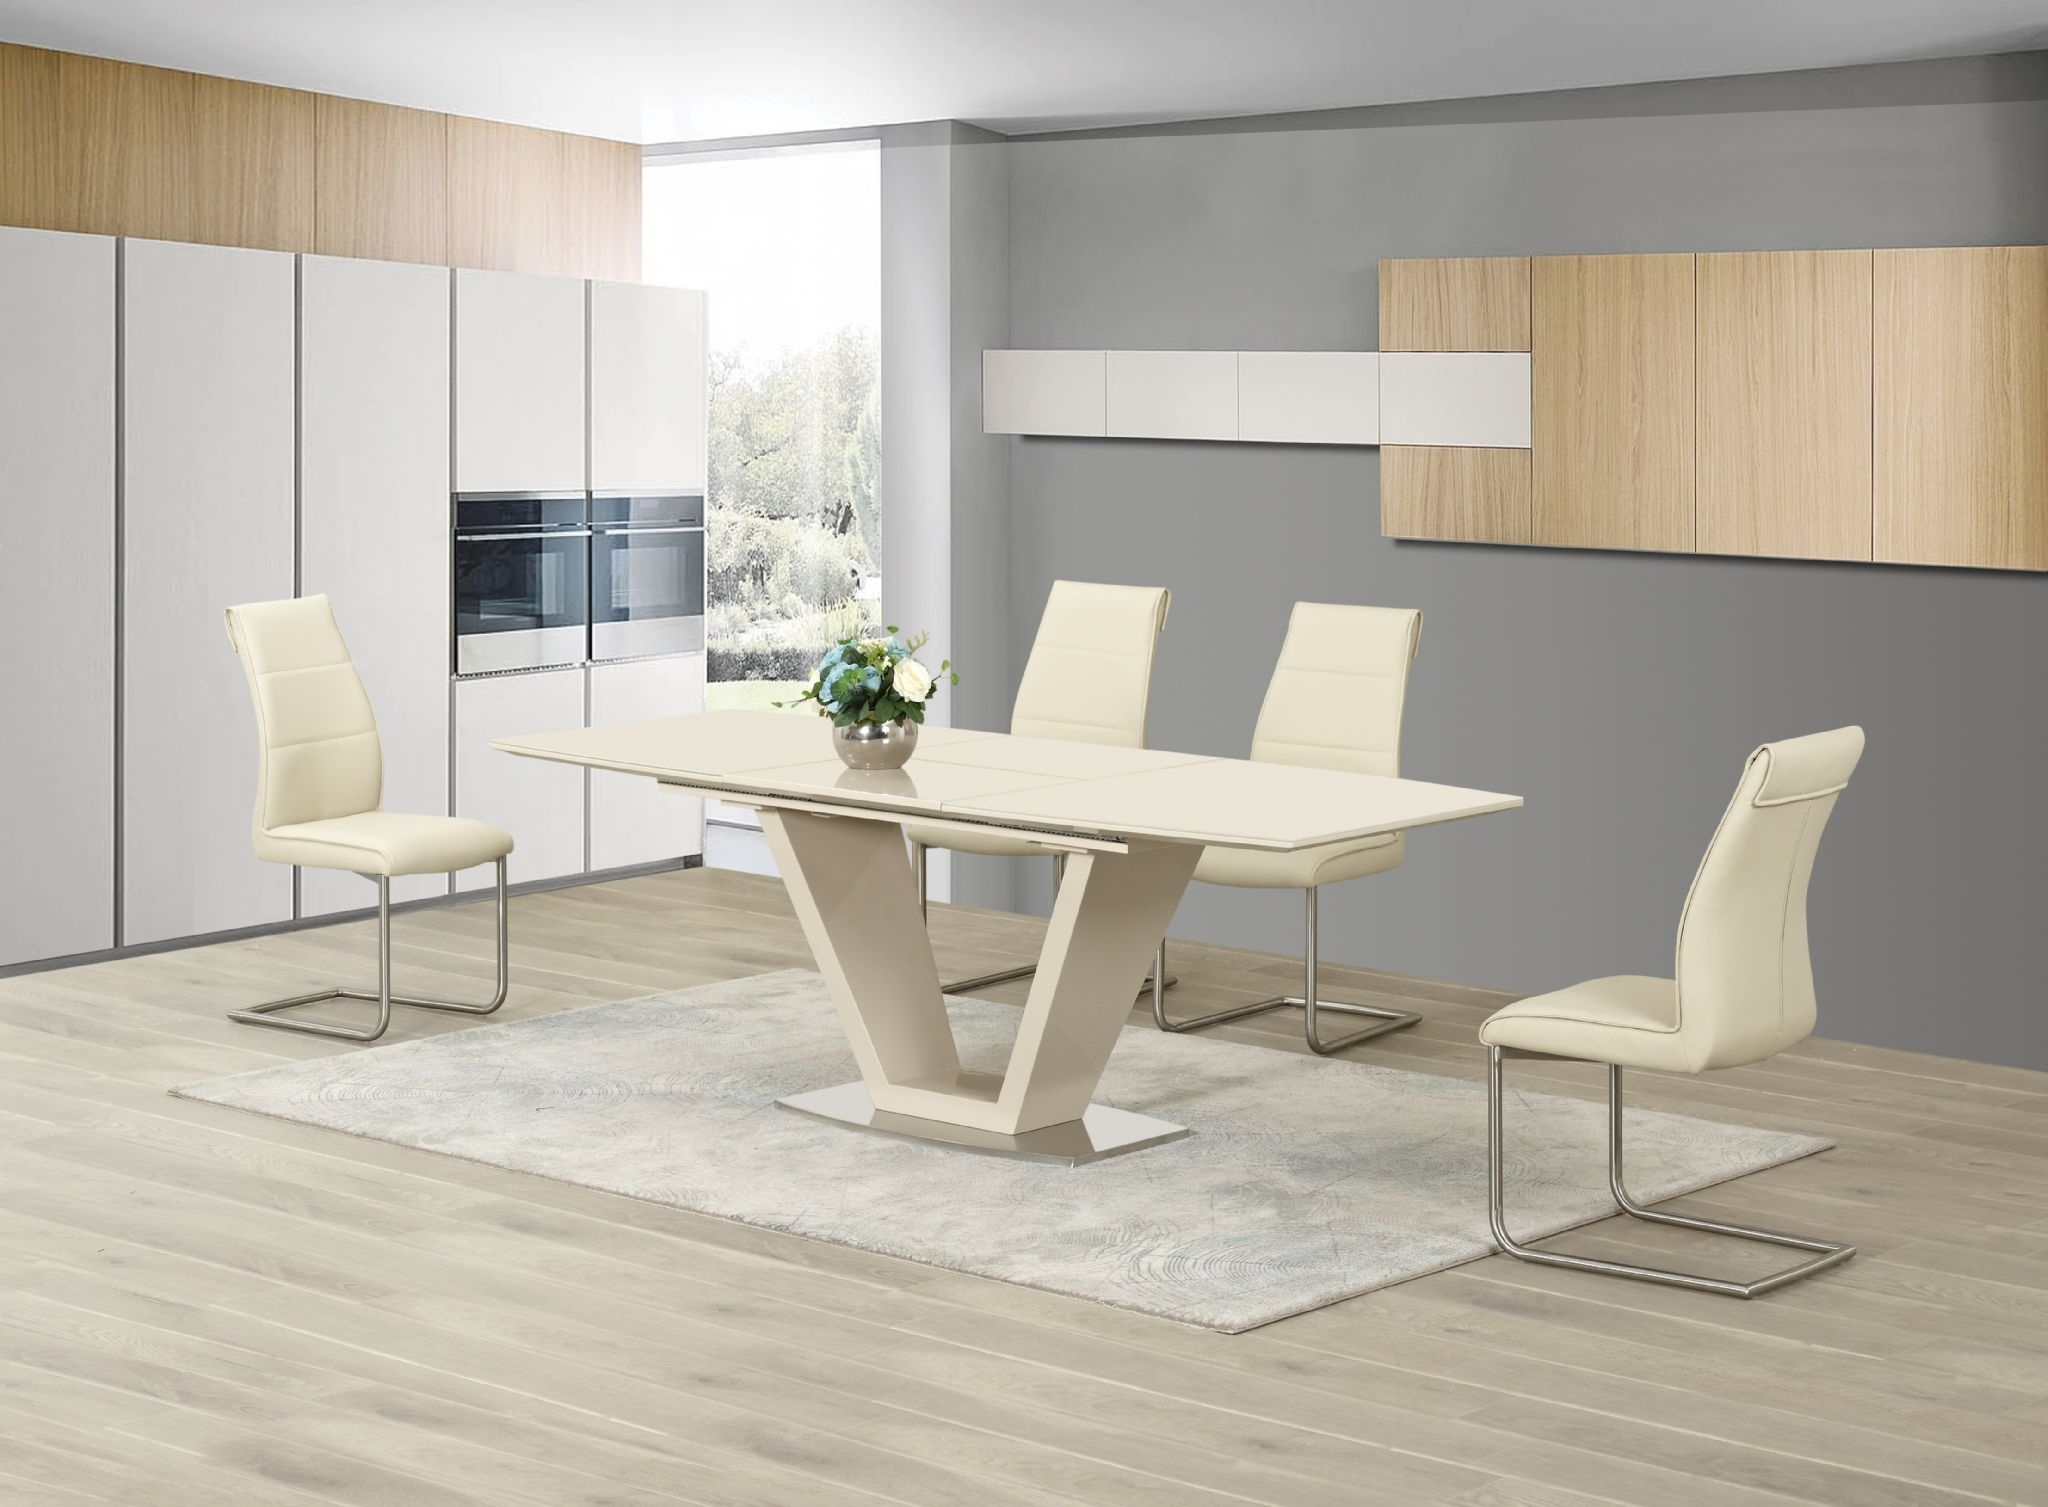 Extending Dining Table Sets inside Well-known Ga Loriga Cream Gloss Glass Designer Dining Table Extending 160 220